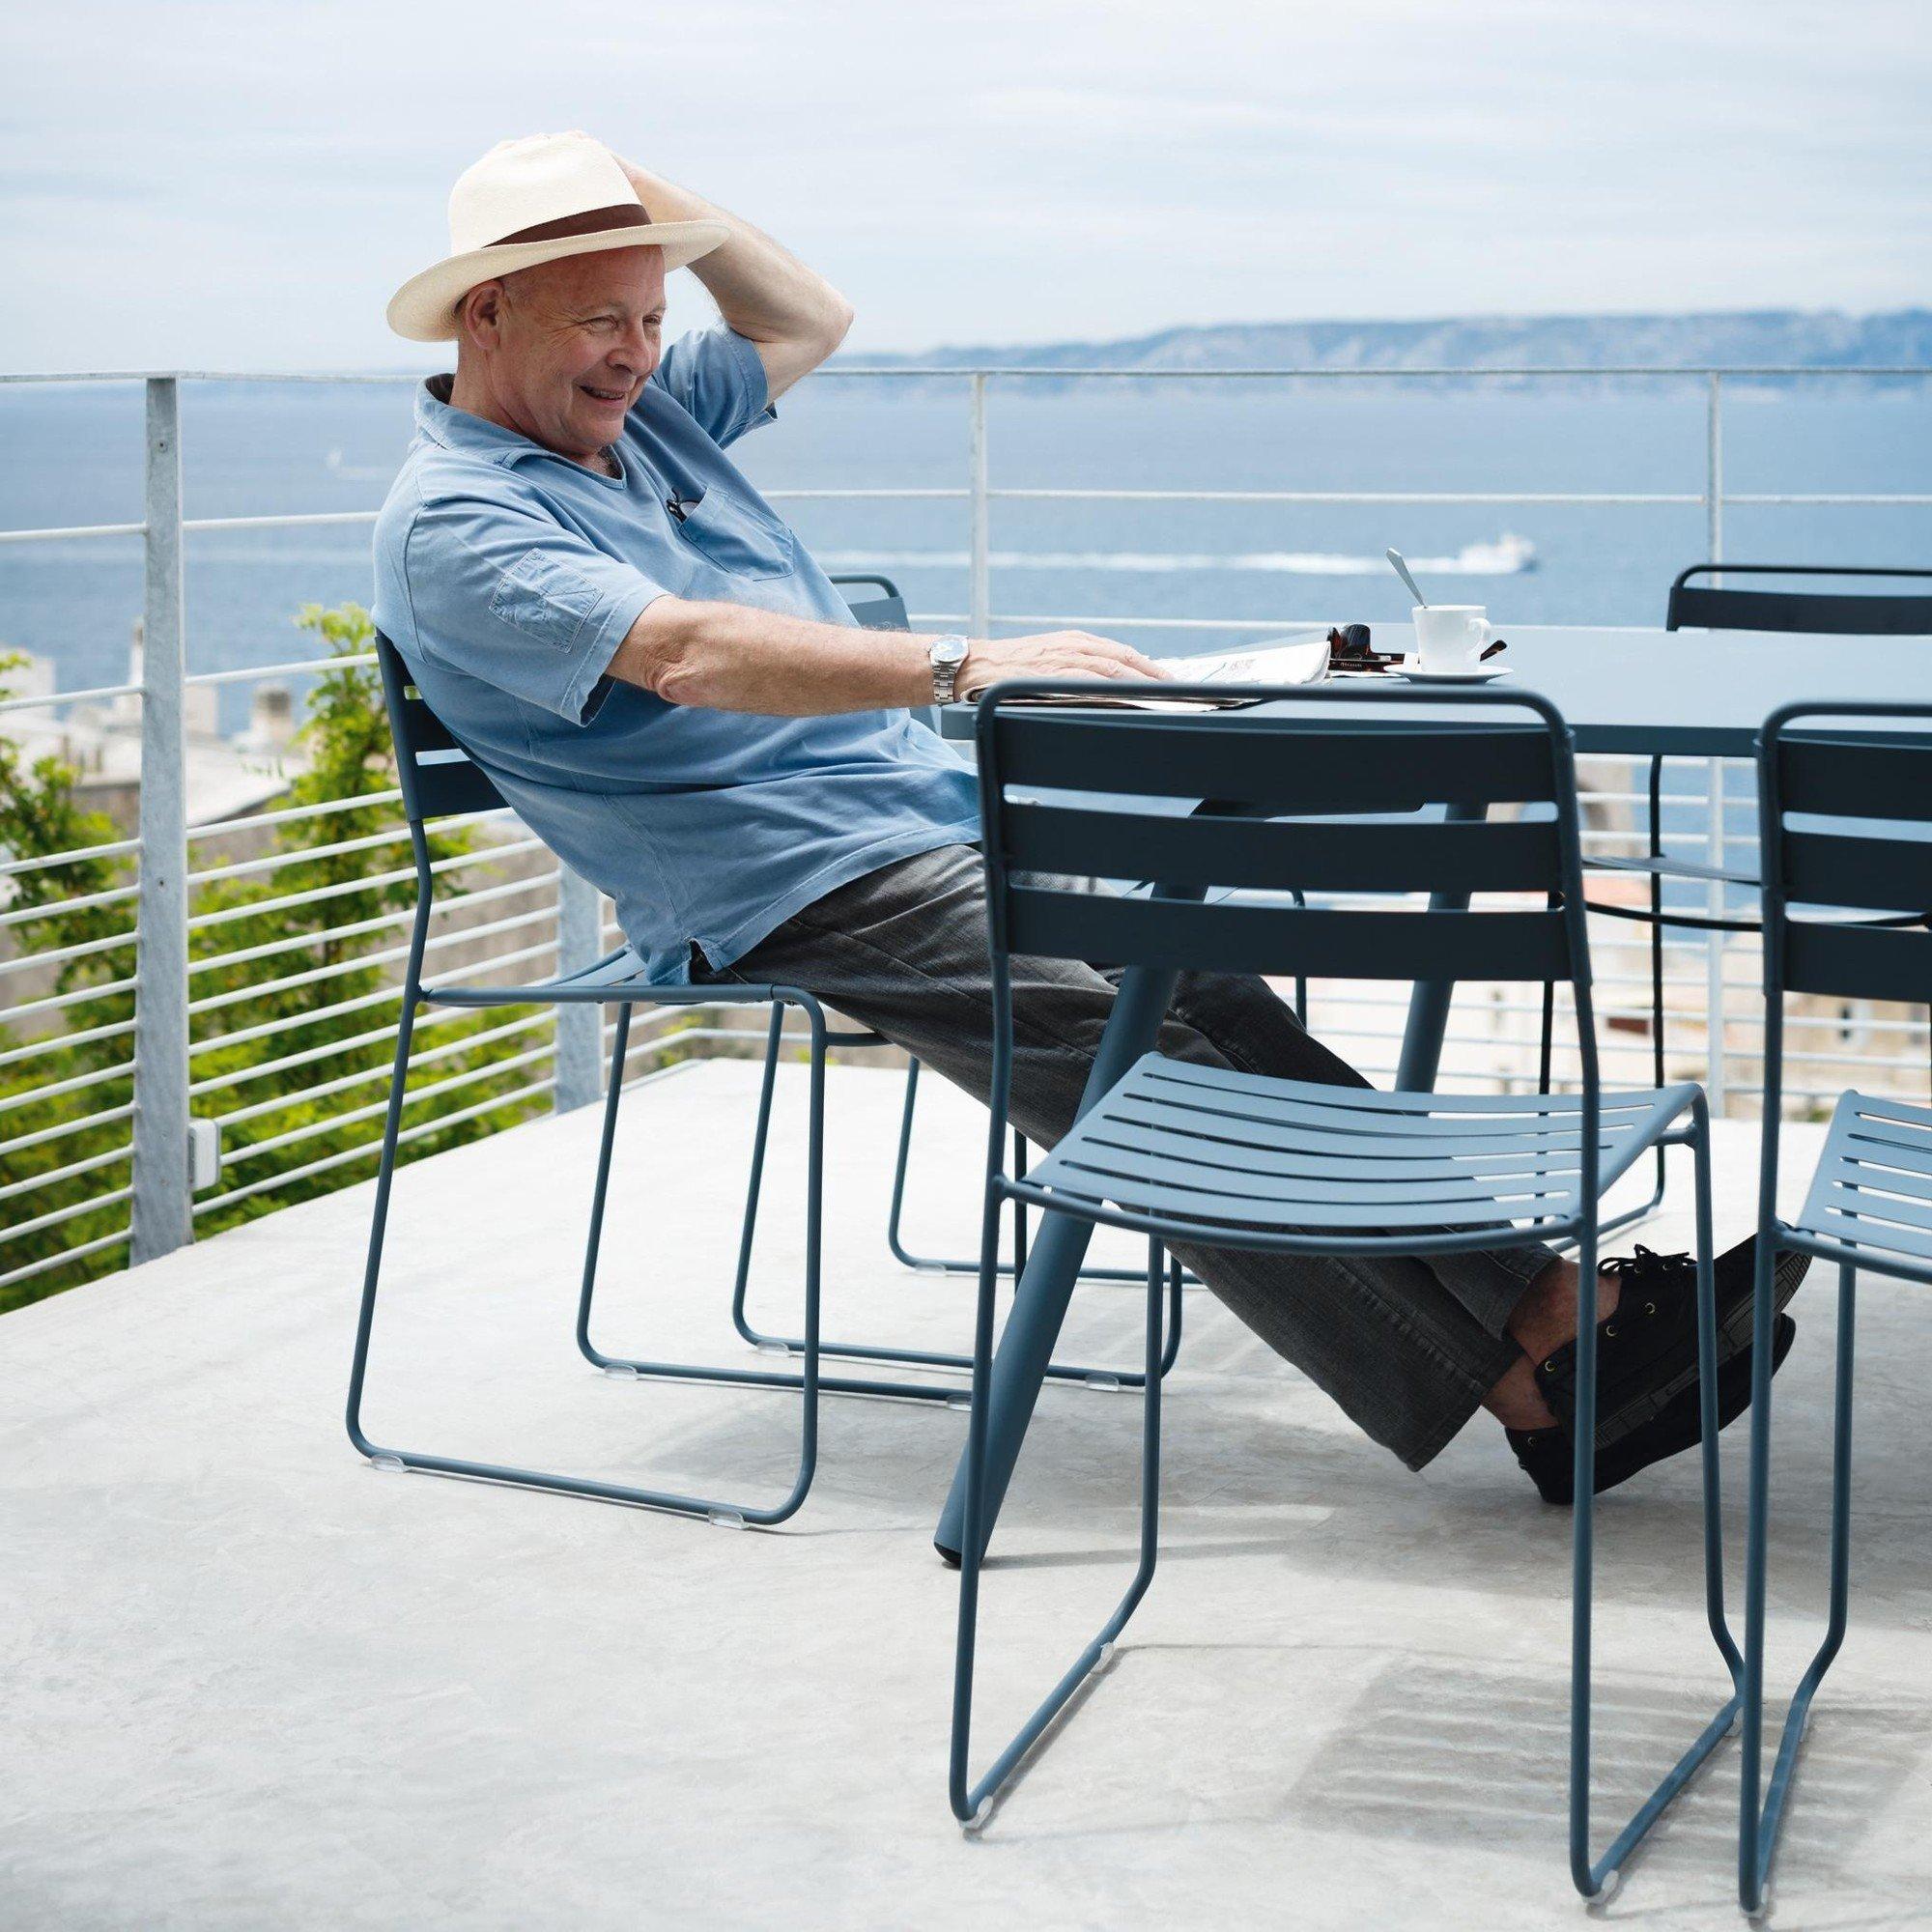 Fermob Surprising Lounger Sessel inkl. Fußablage | AmbienteDirect